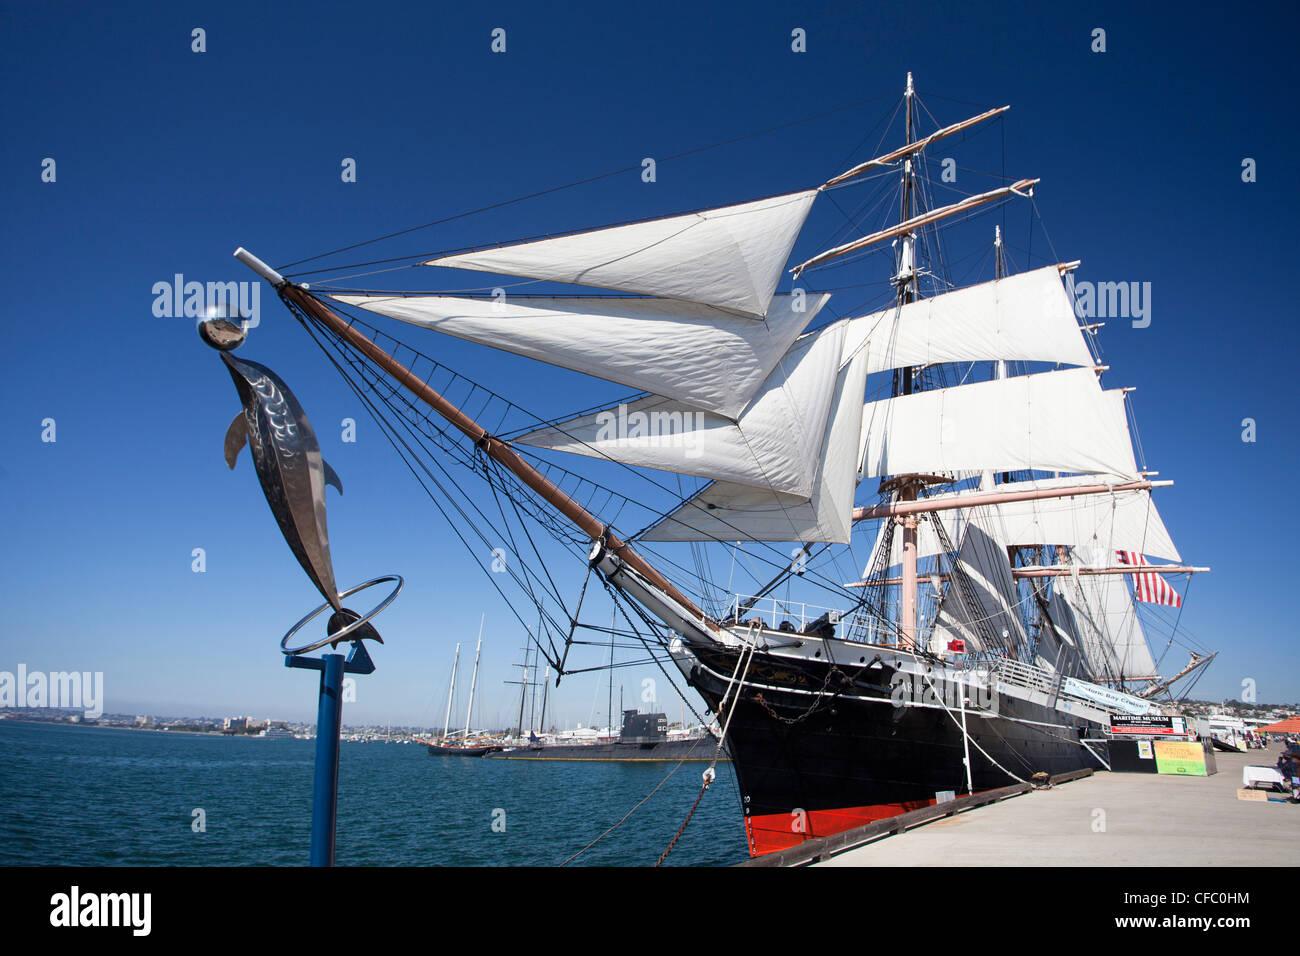 Stati Uniti d'America, Stati Uniti, America, California, San Diego, città museo marittimo, barca a vela, Immagini Stock